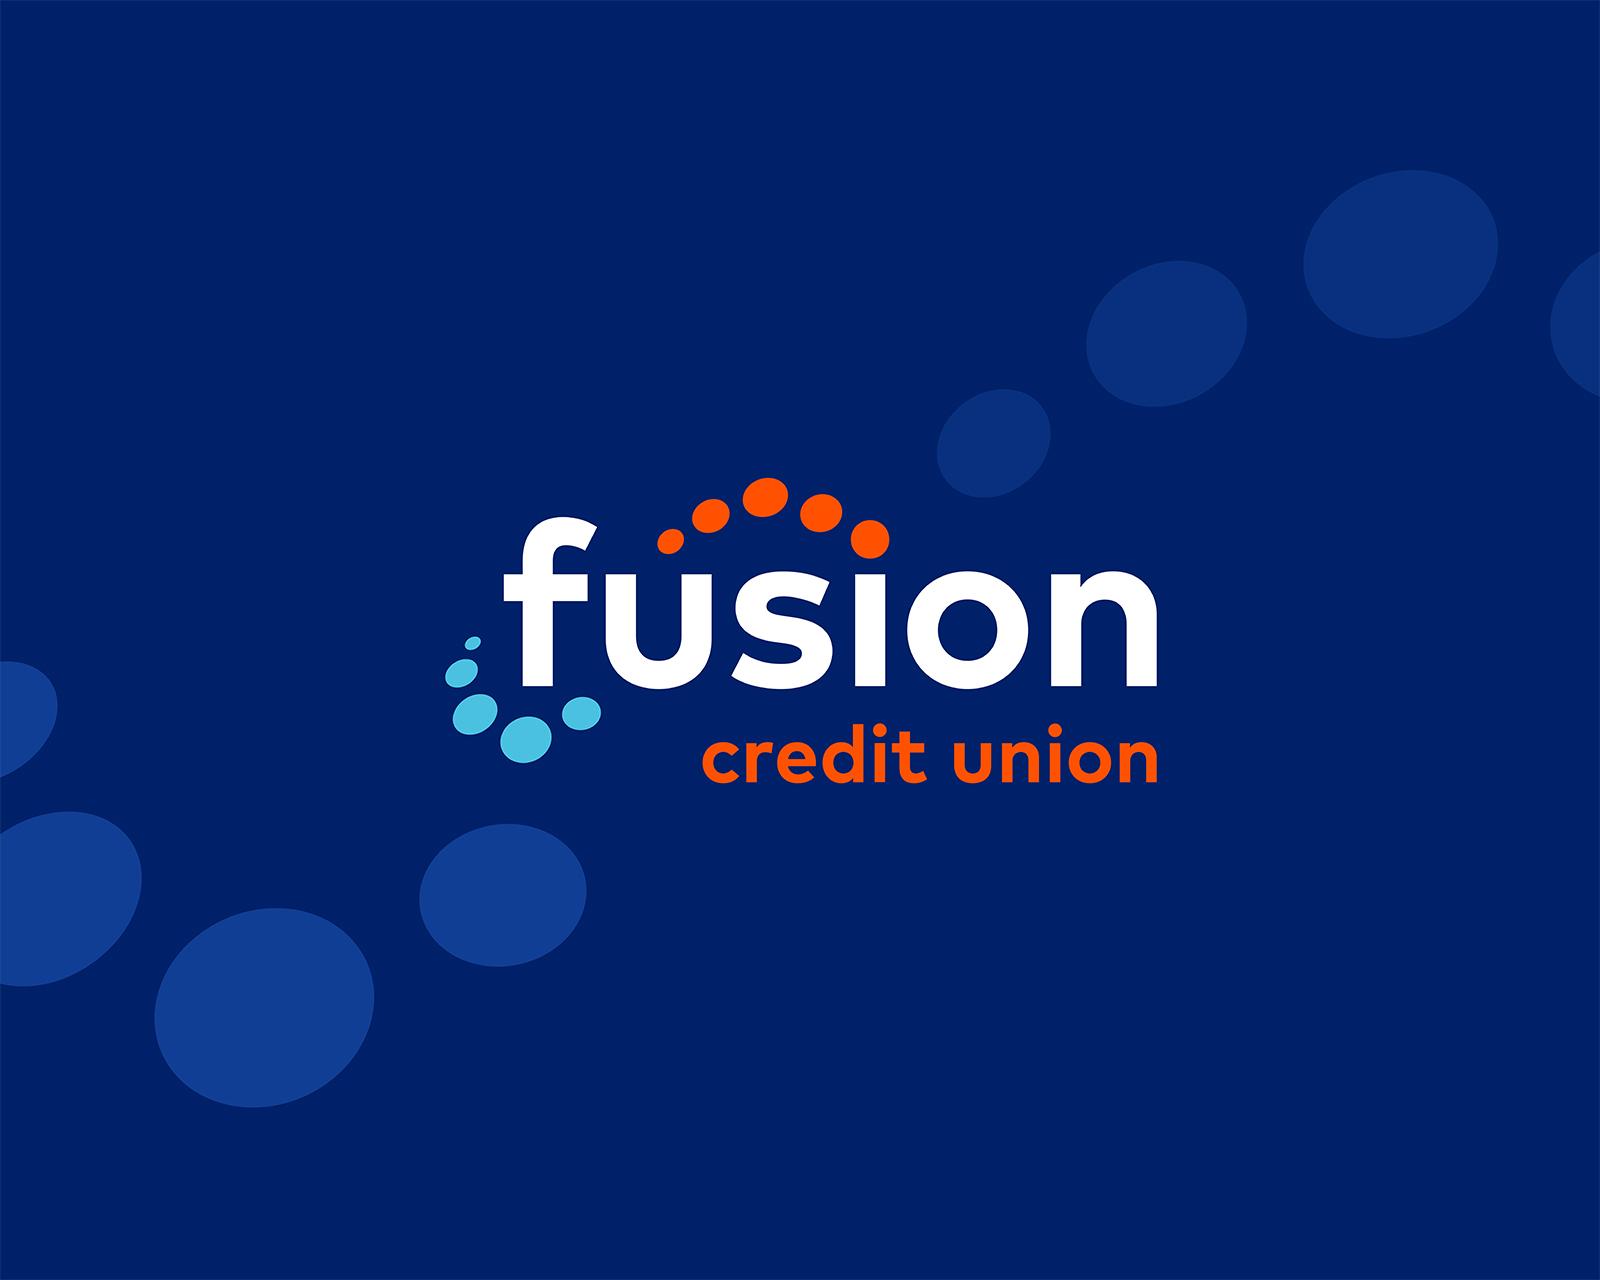 Fusion credit union logo with dark blue background. Small circles run diagonally across the photo.